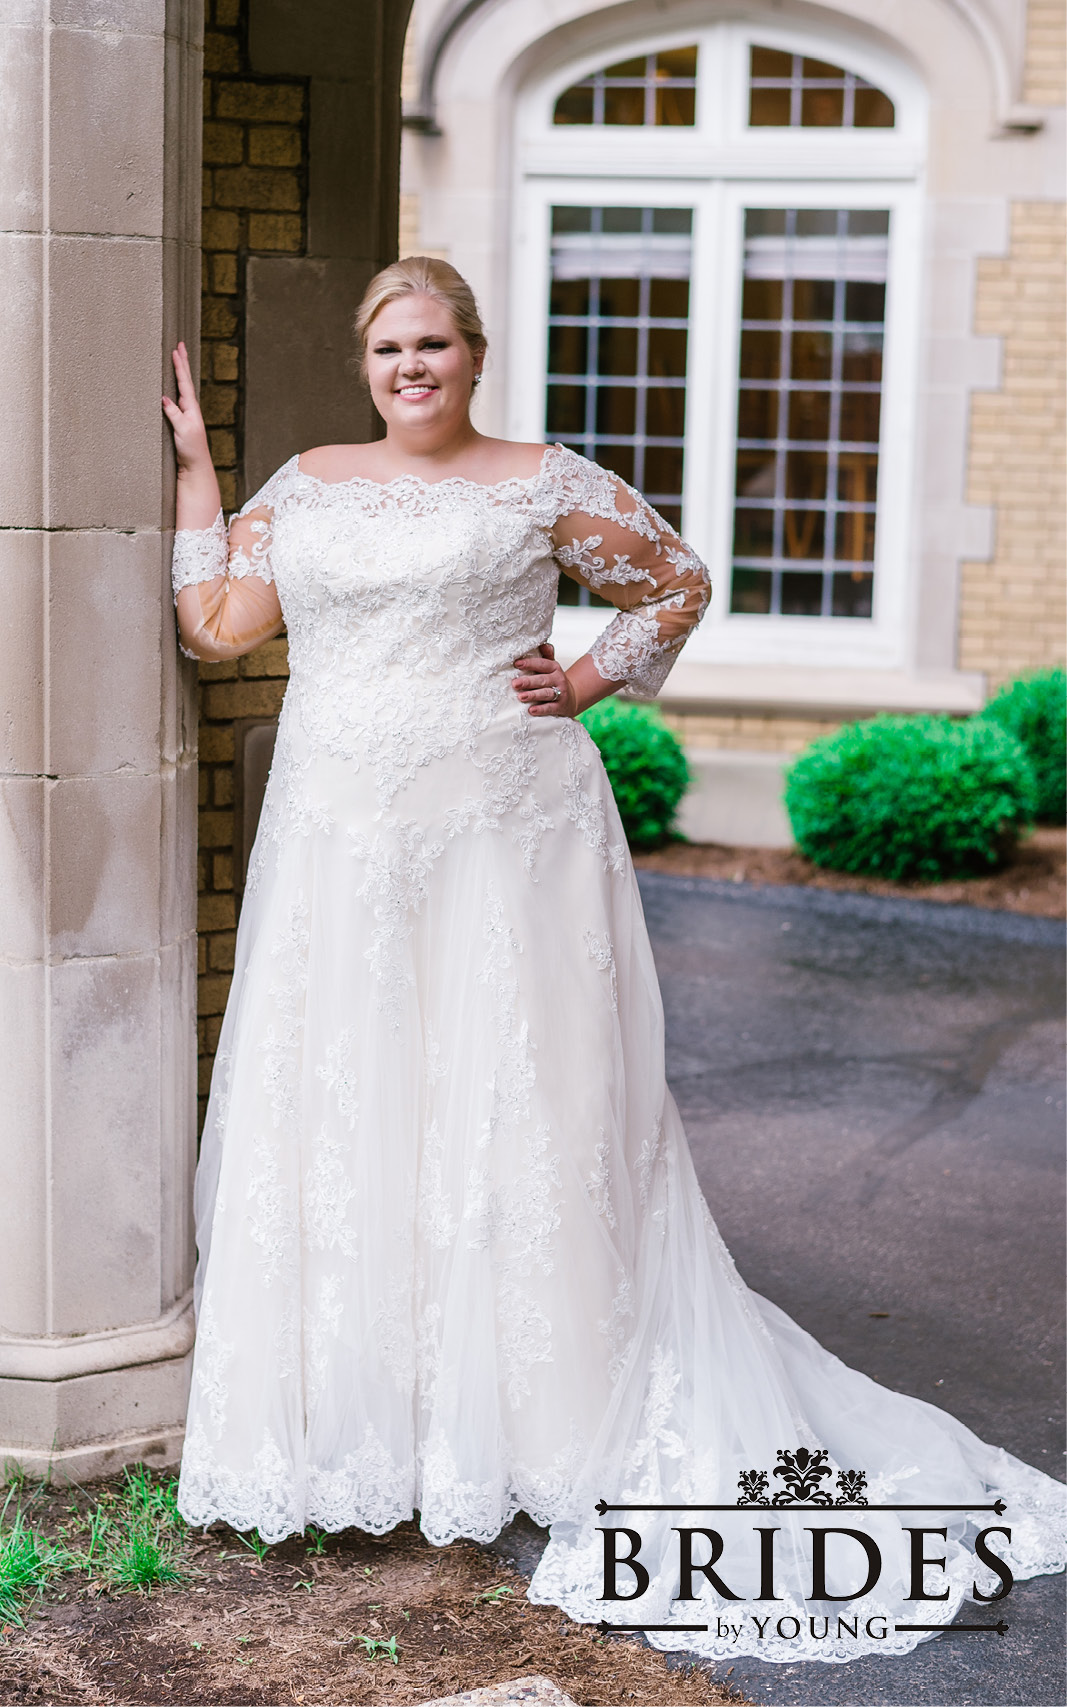 BridesbyYoung-2020Collection-PlusSizeBridalBoutique-CurvyWeddingDressInspiration-153.jpg